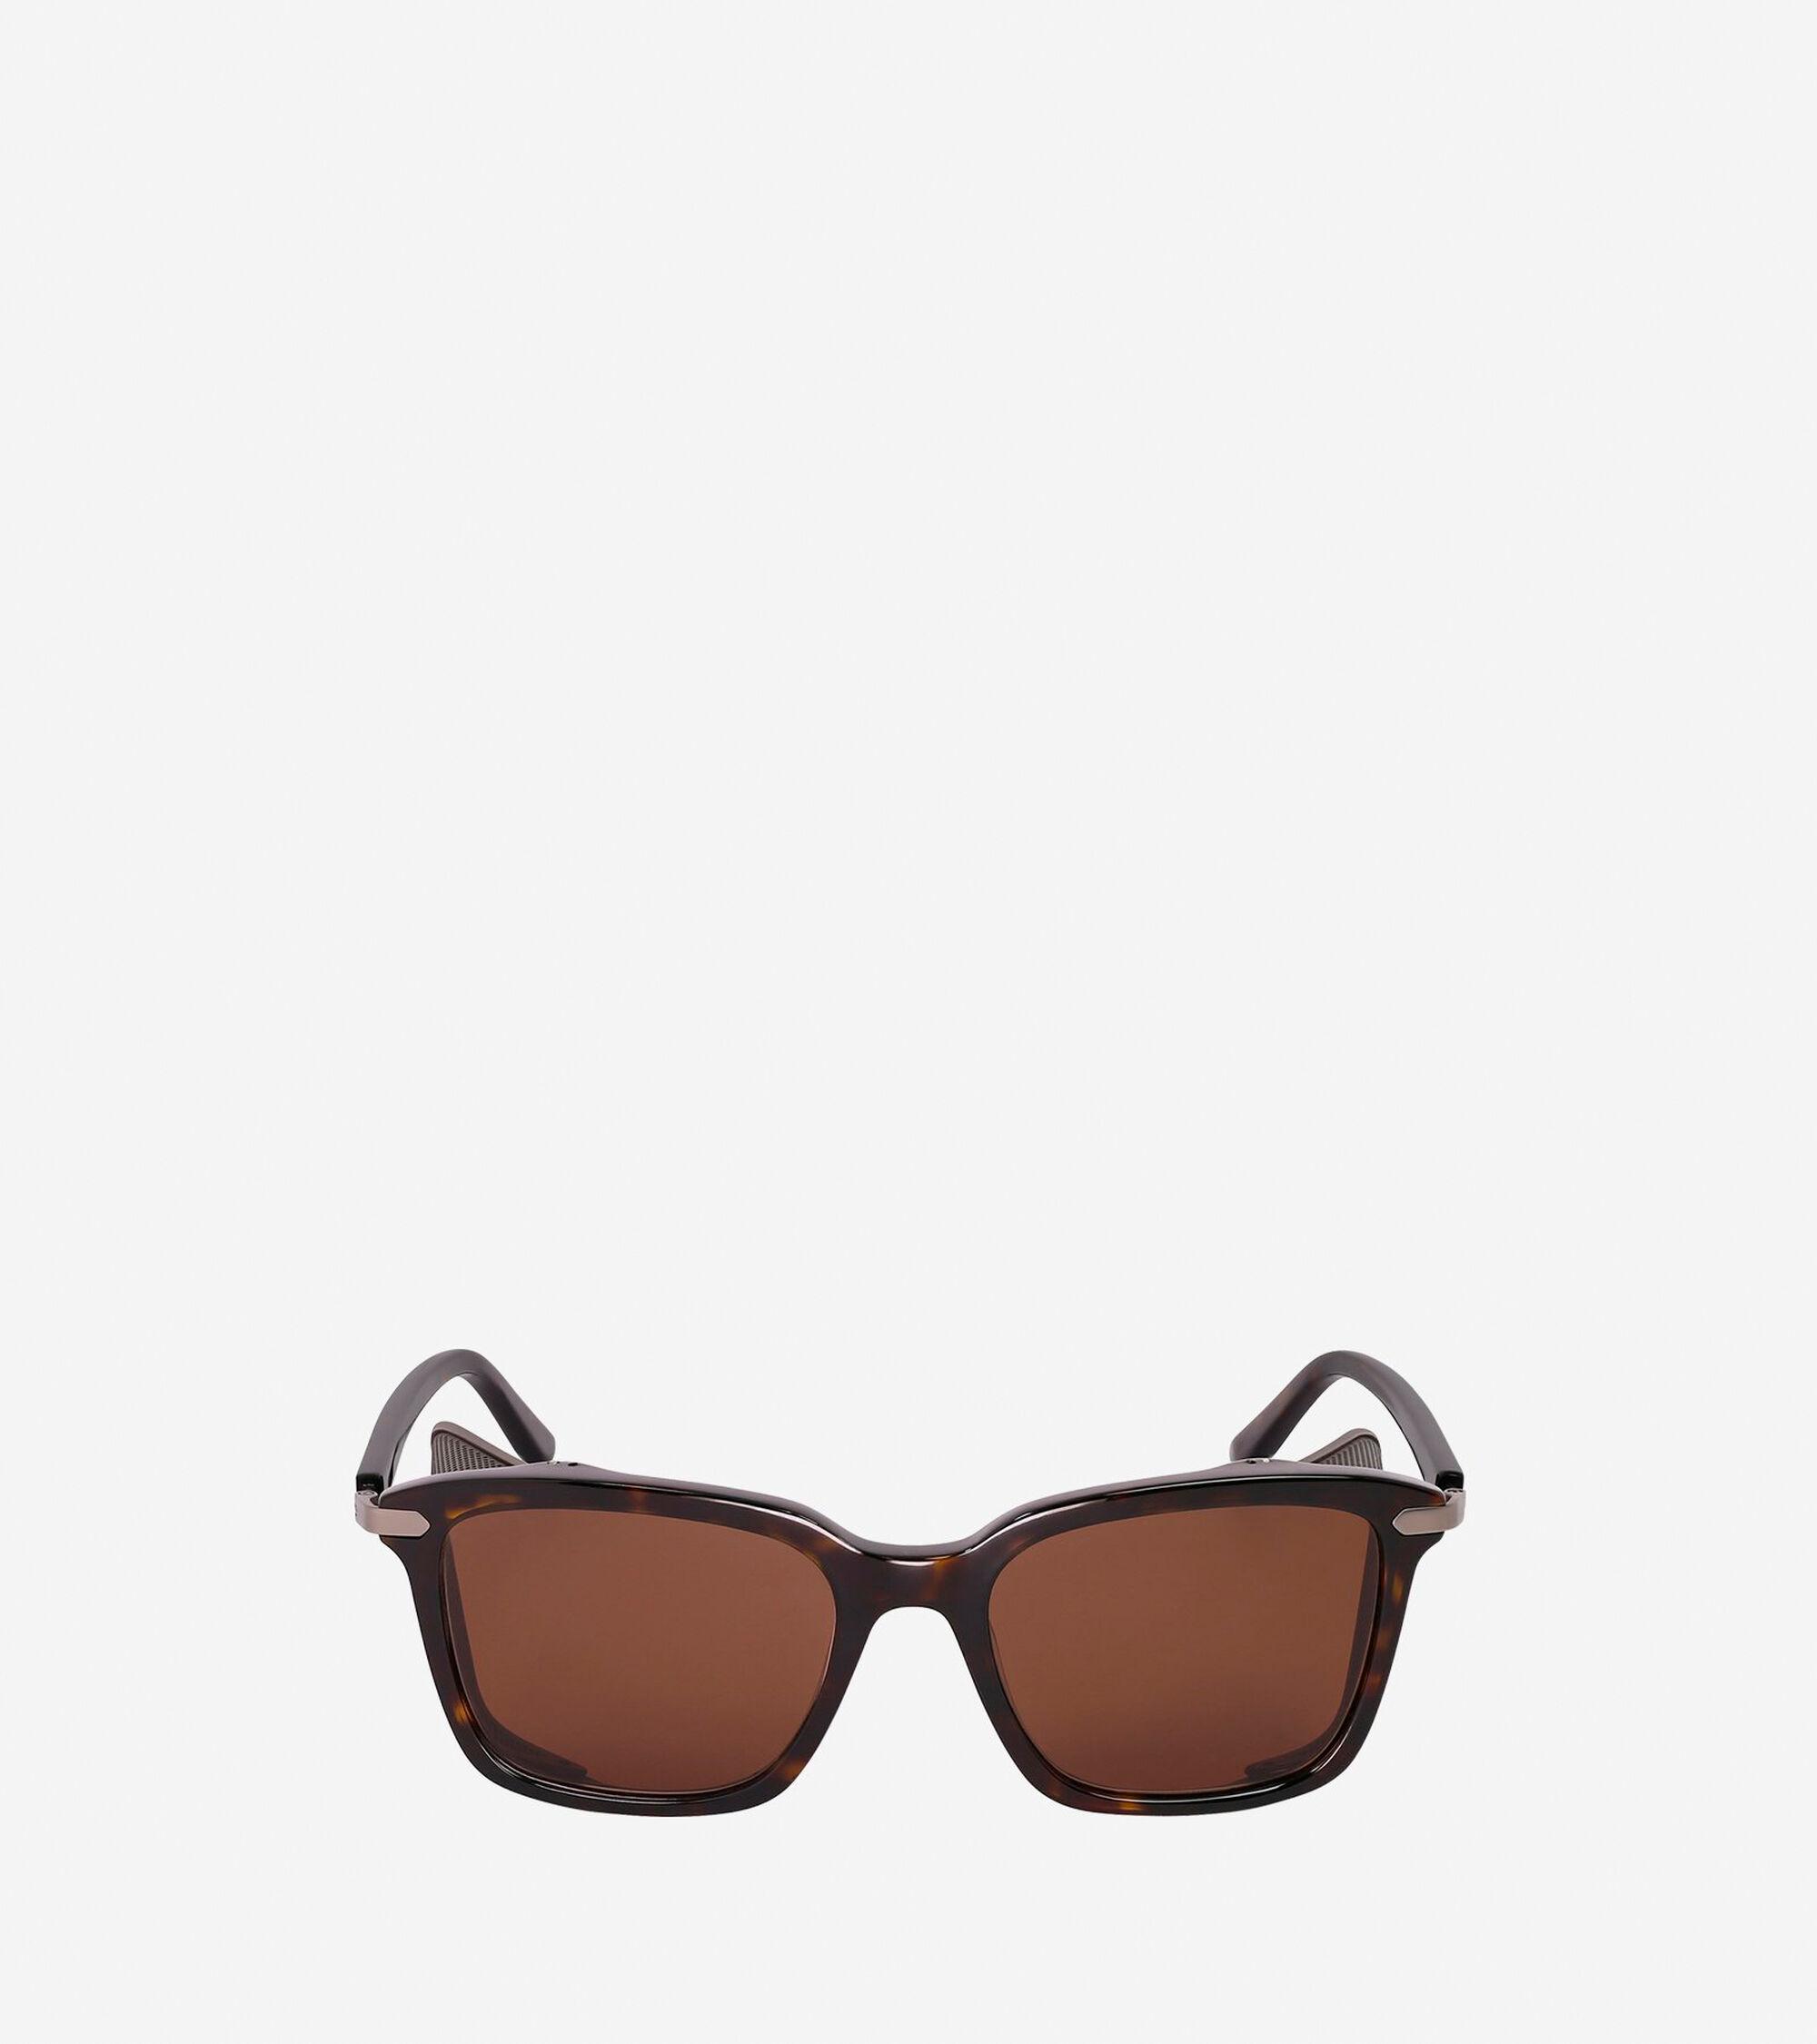 f006f6eaadf Men s Glacier Frame Sunglasses in Dark Tortoise